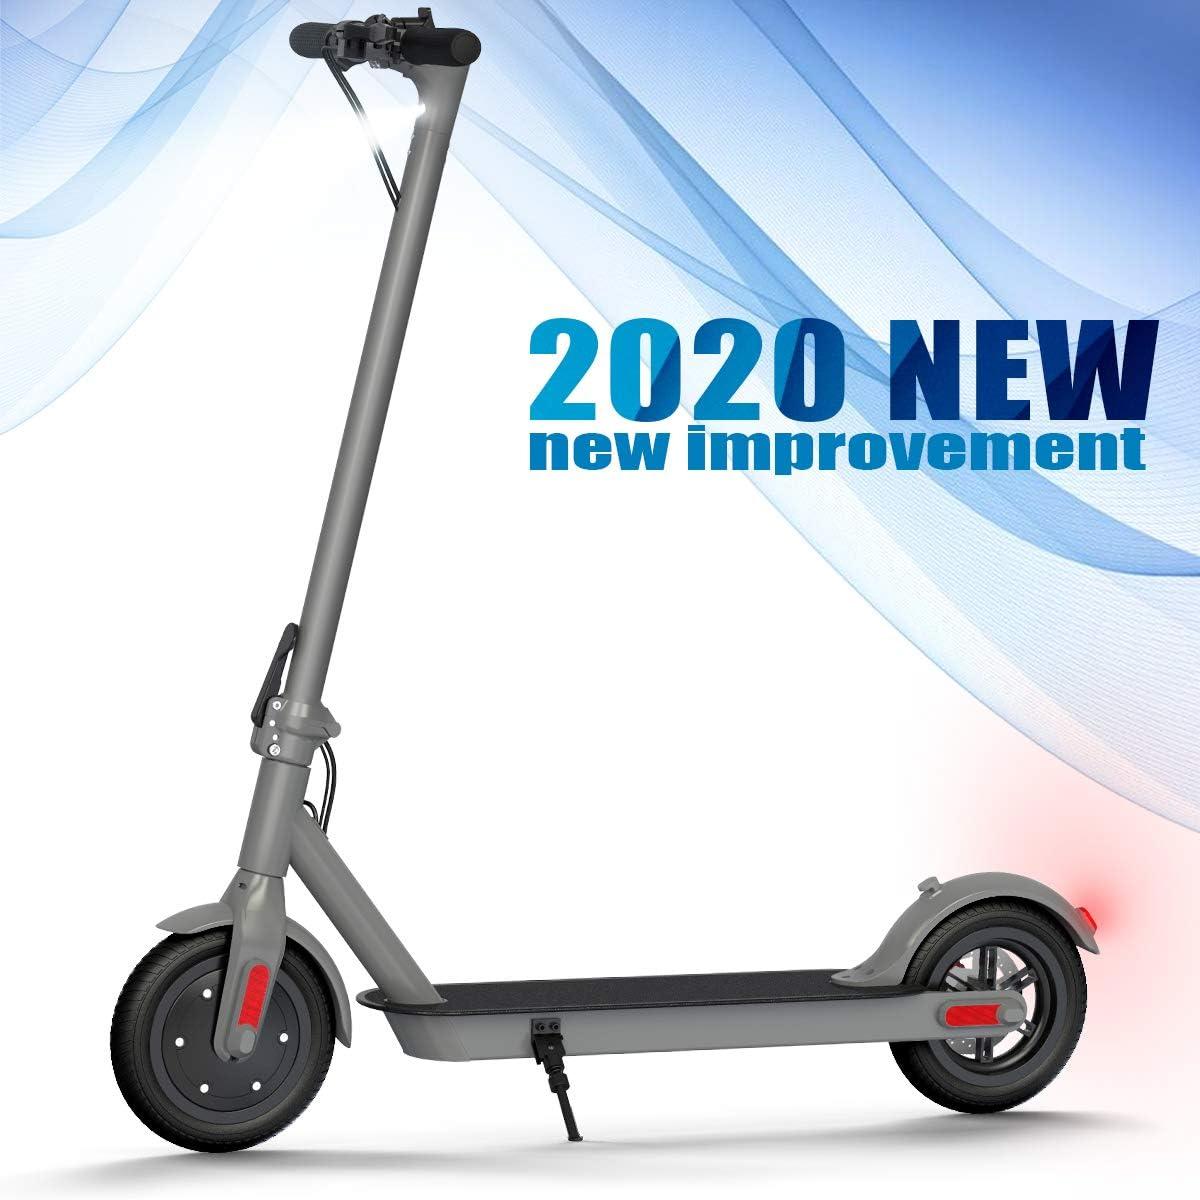 urbetter Mi Scooter Eléctrico, Patinete eléctrico Plegable Adulto y niño, con Alcance de 20 Km, 25km/h